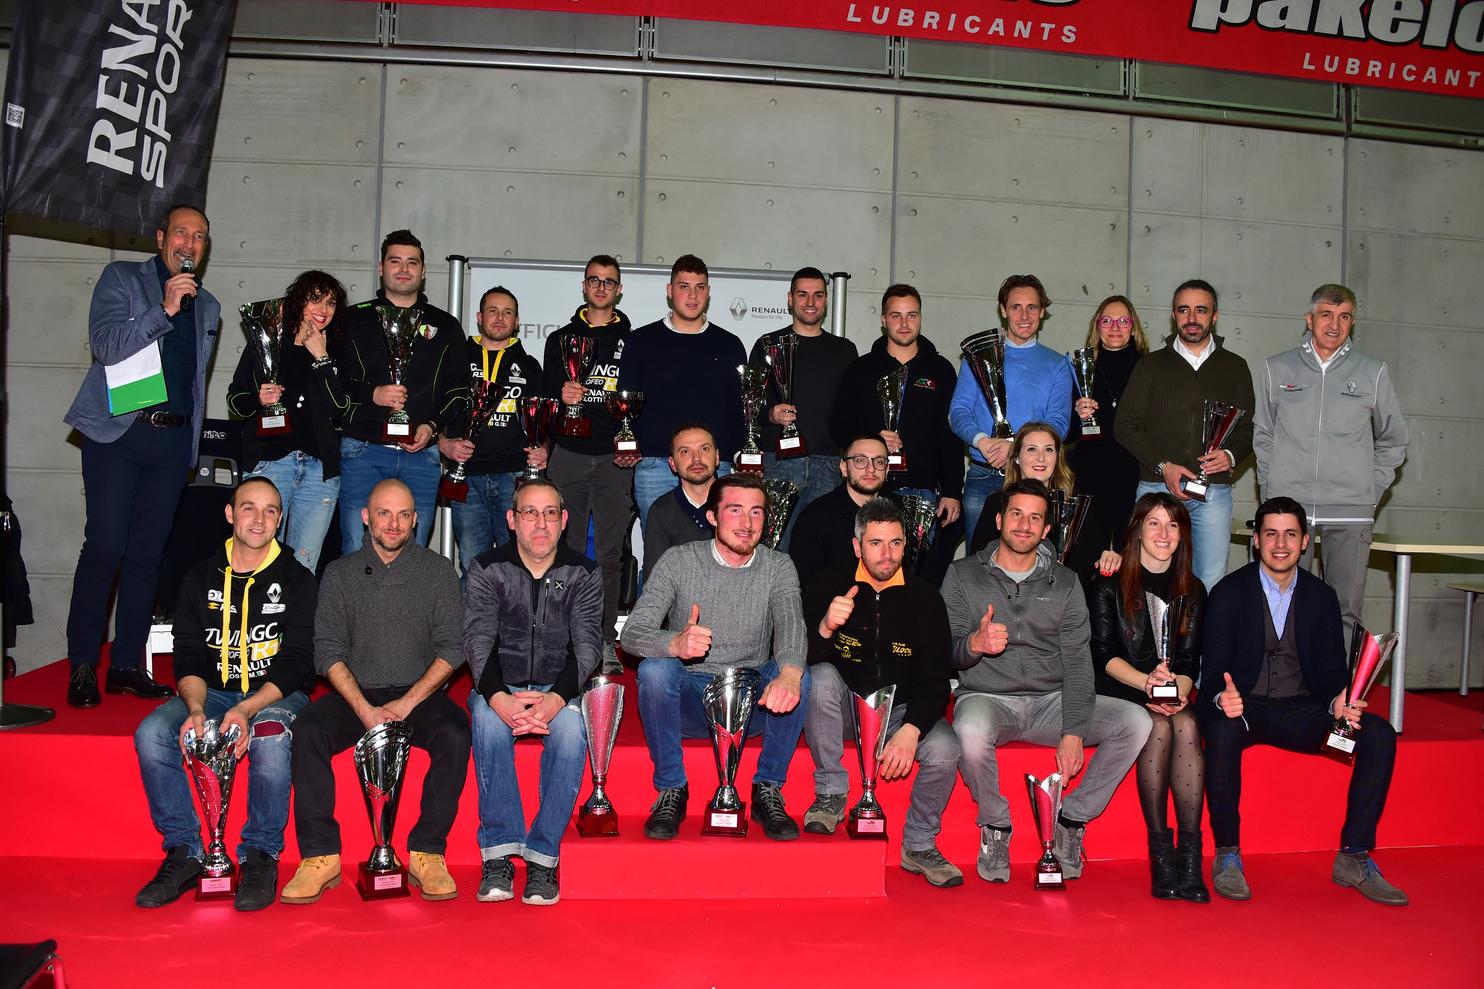 RENAULT PREMIA I CAMPIONI DEI TROFEI RALLY 2018 AL SALONE AUTOMOTORACING DI TORINO